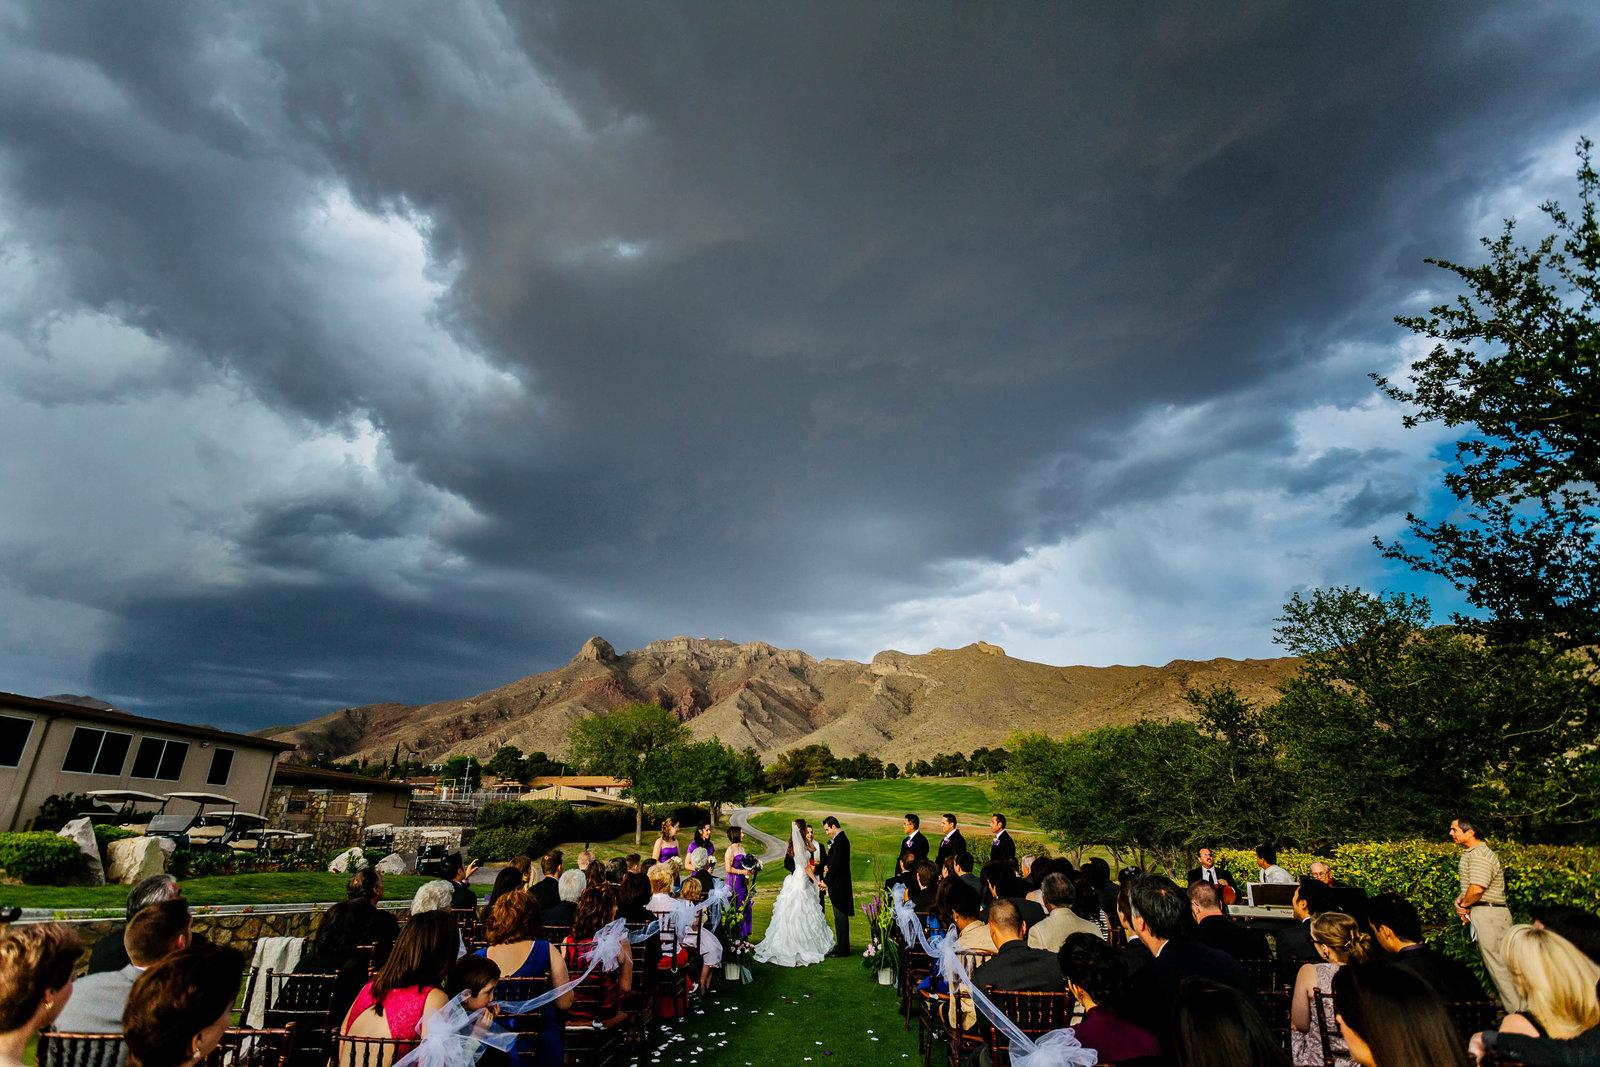 106-El-paso-wedding-photographer-El Paso Wedding Photographer_M02